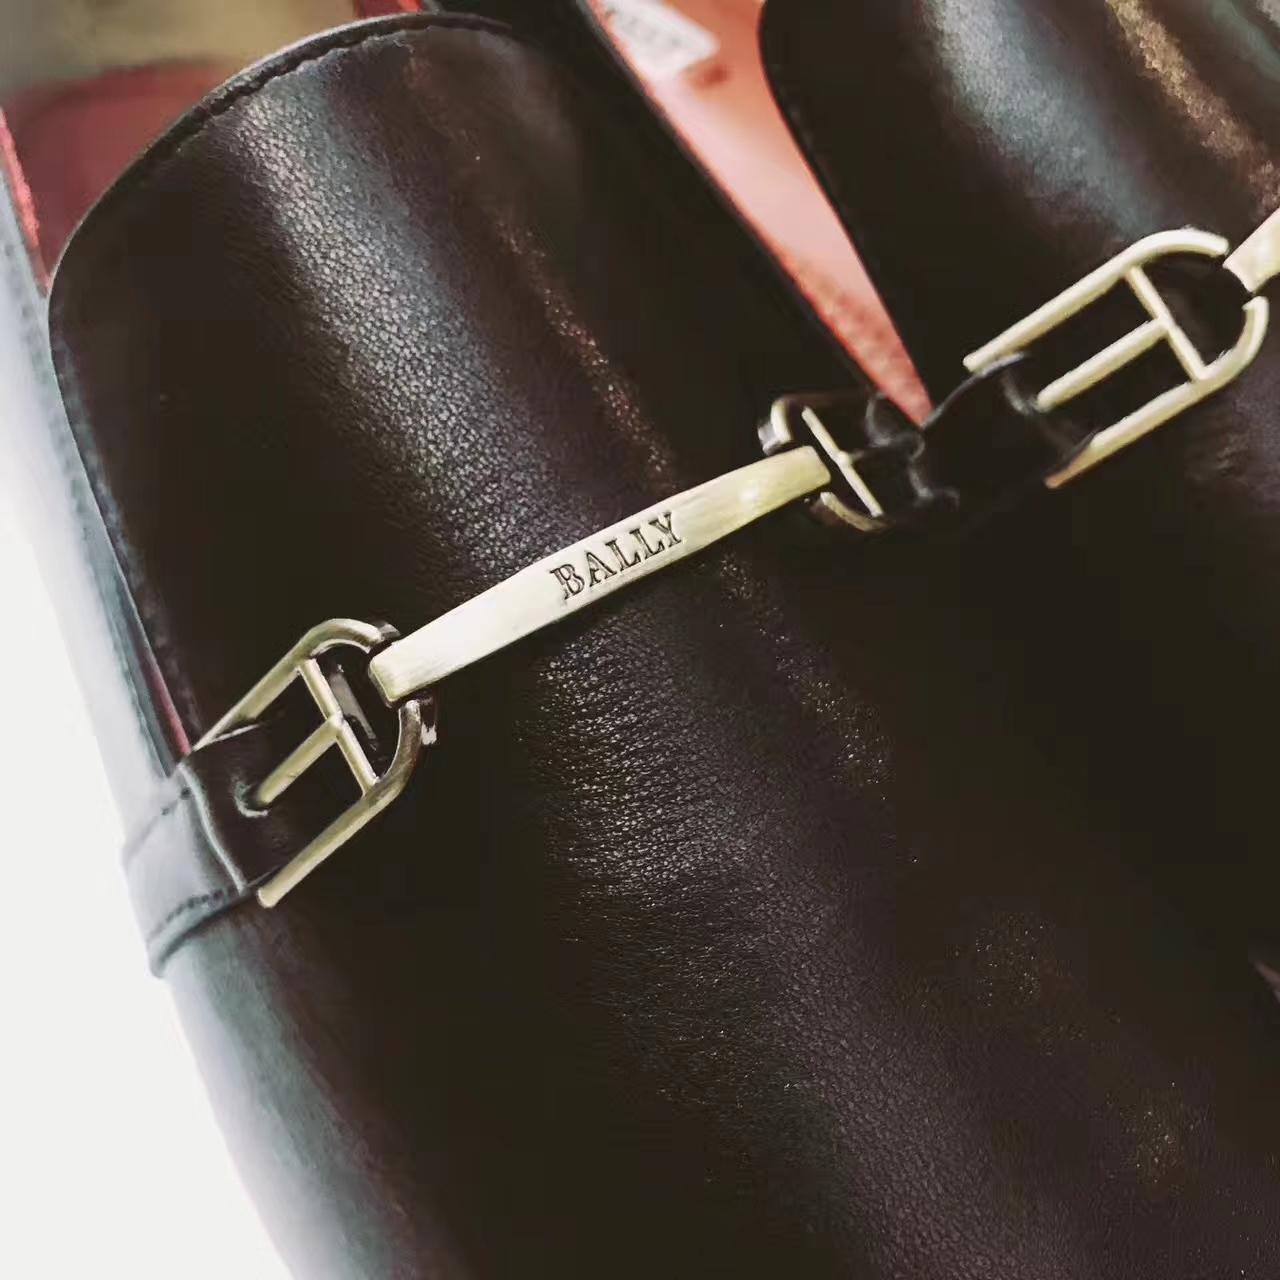 Bally女鞋货源 优雅的中性经典款平底单鞋